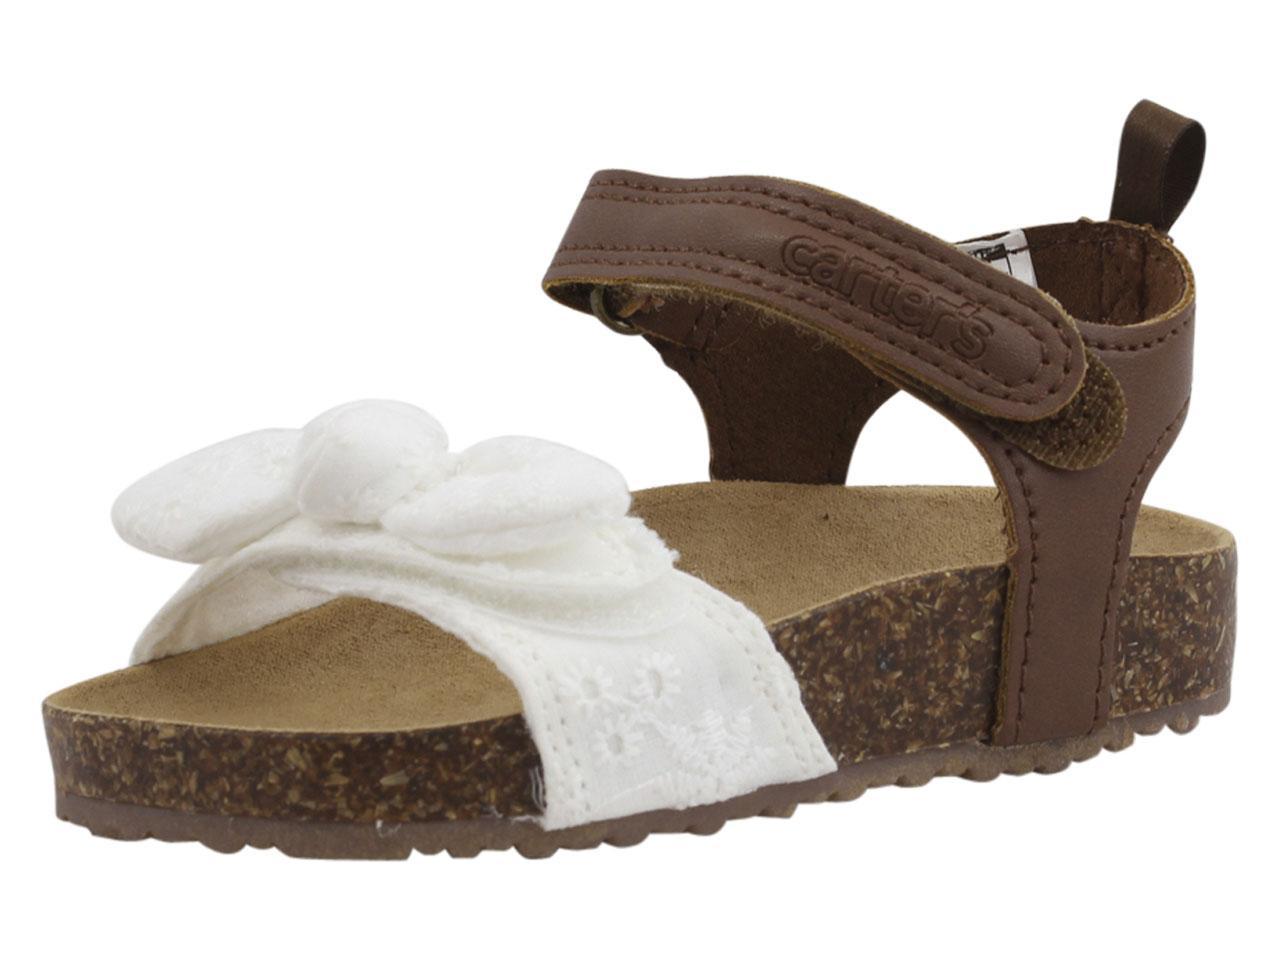 42d6c329f3e Carter s Toddler Little Girl s Welsie Sandals Shoes